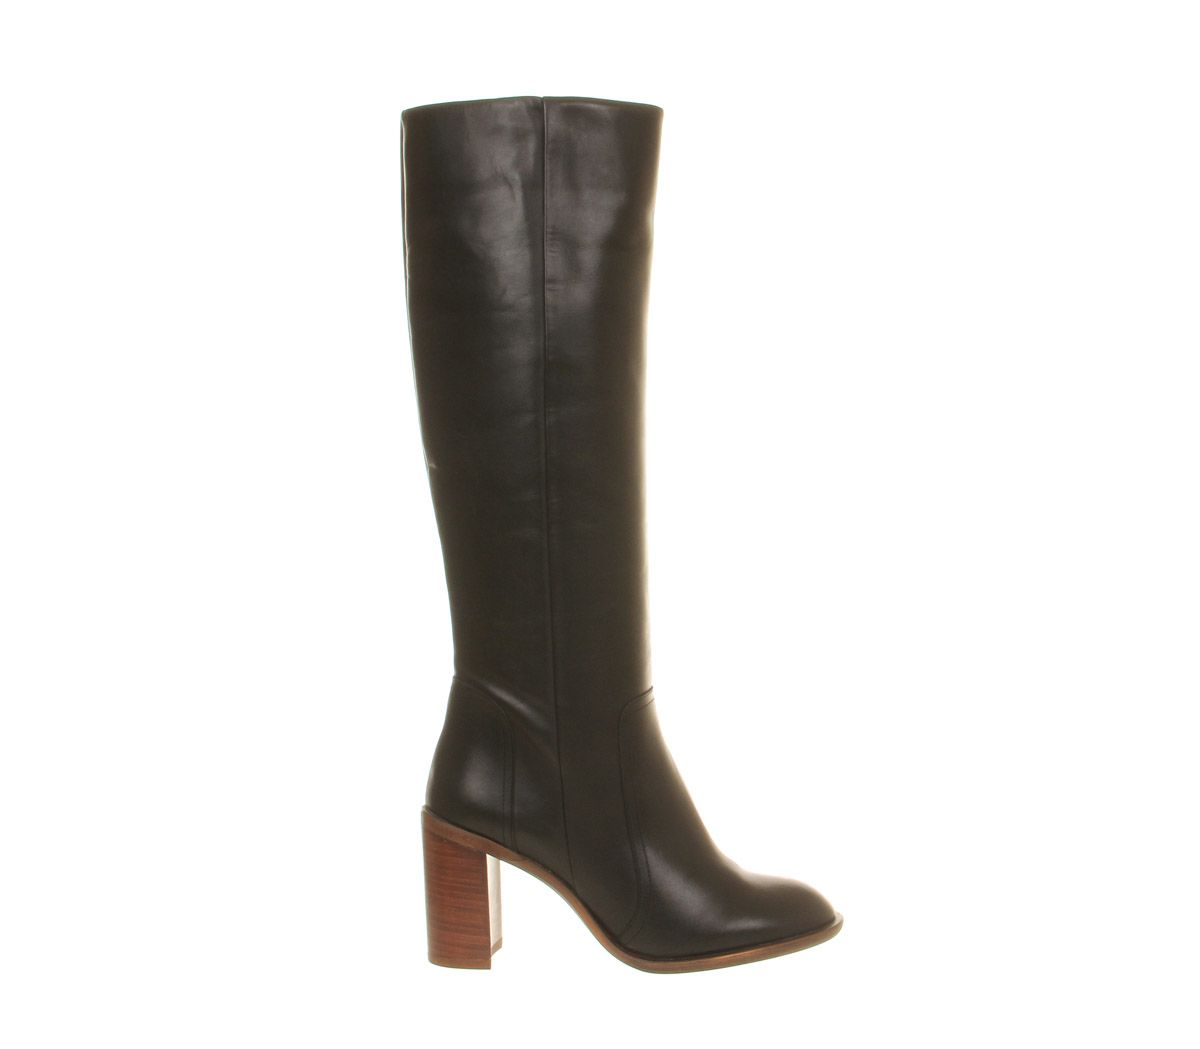 7ba93e91f68 Daily Office Nala Clean Block Heel boots Black Leather ZA77813 ...